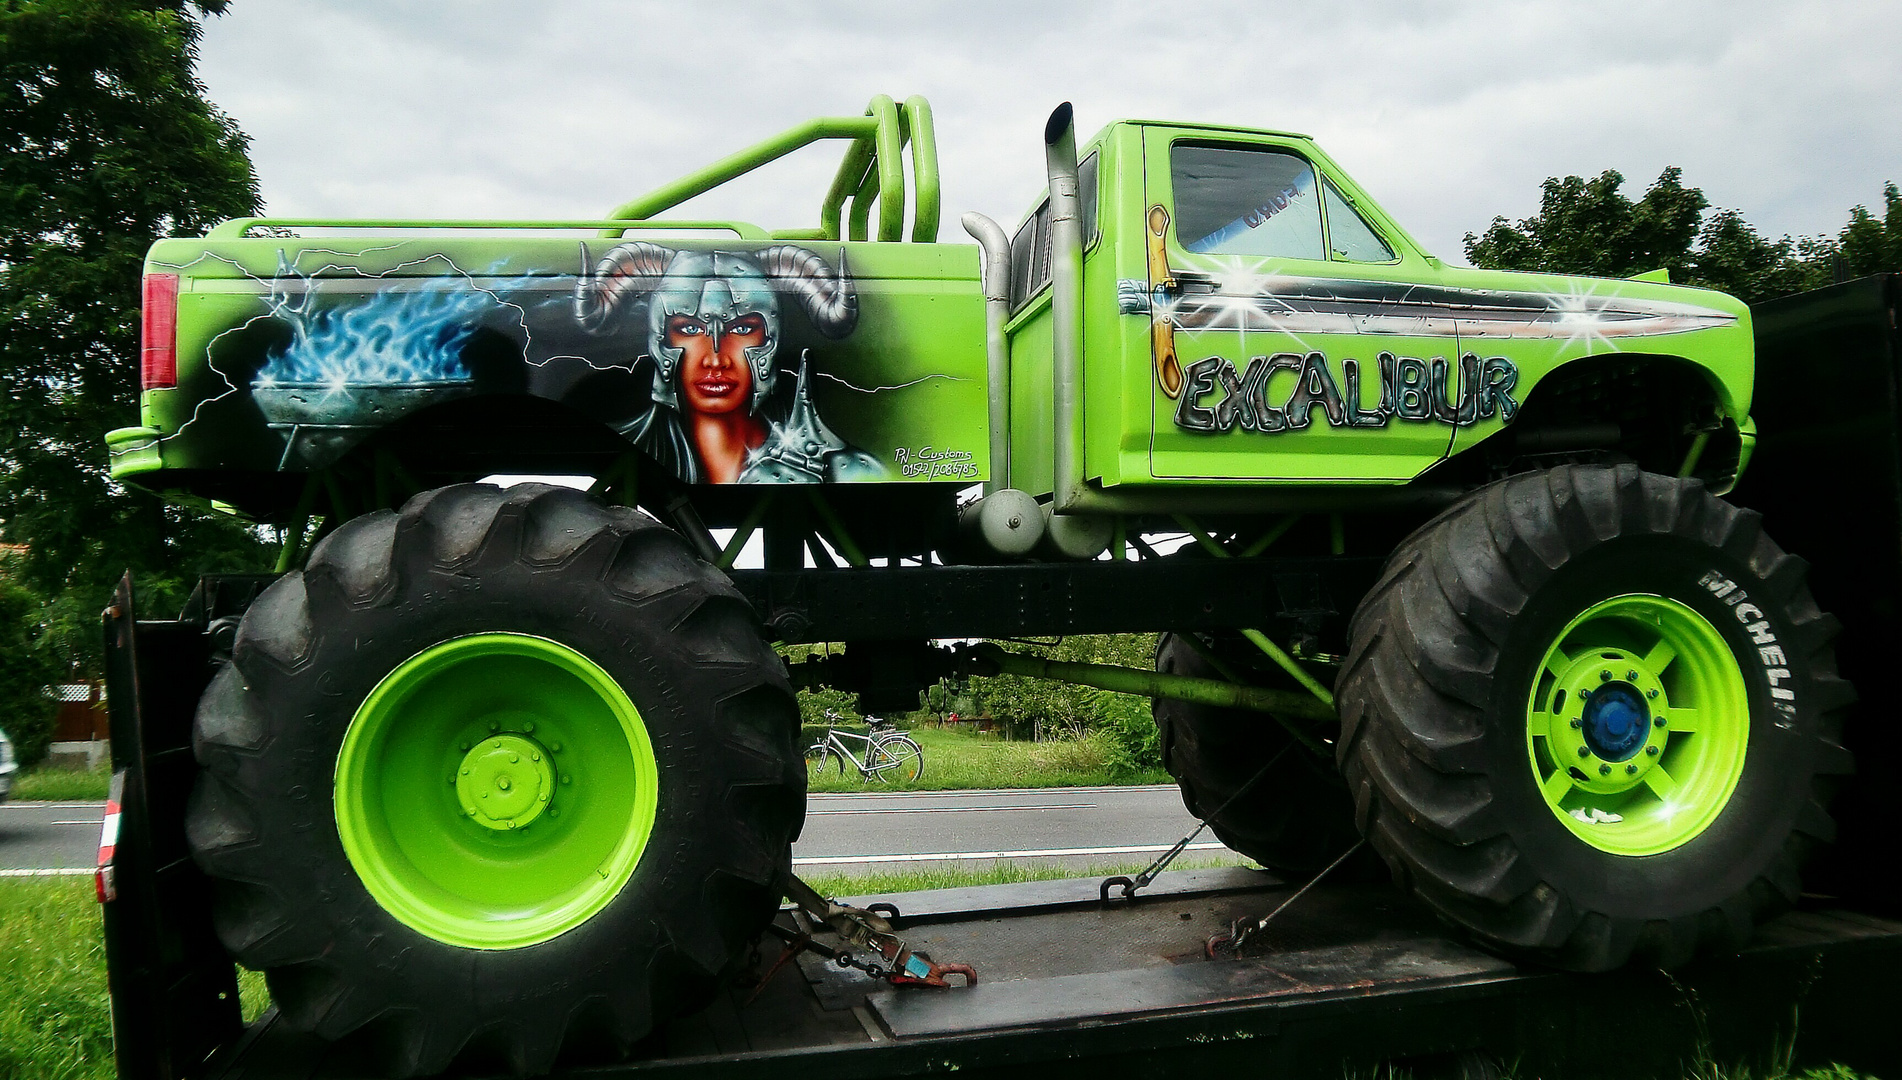 Das Monster ist bereit zum Transport